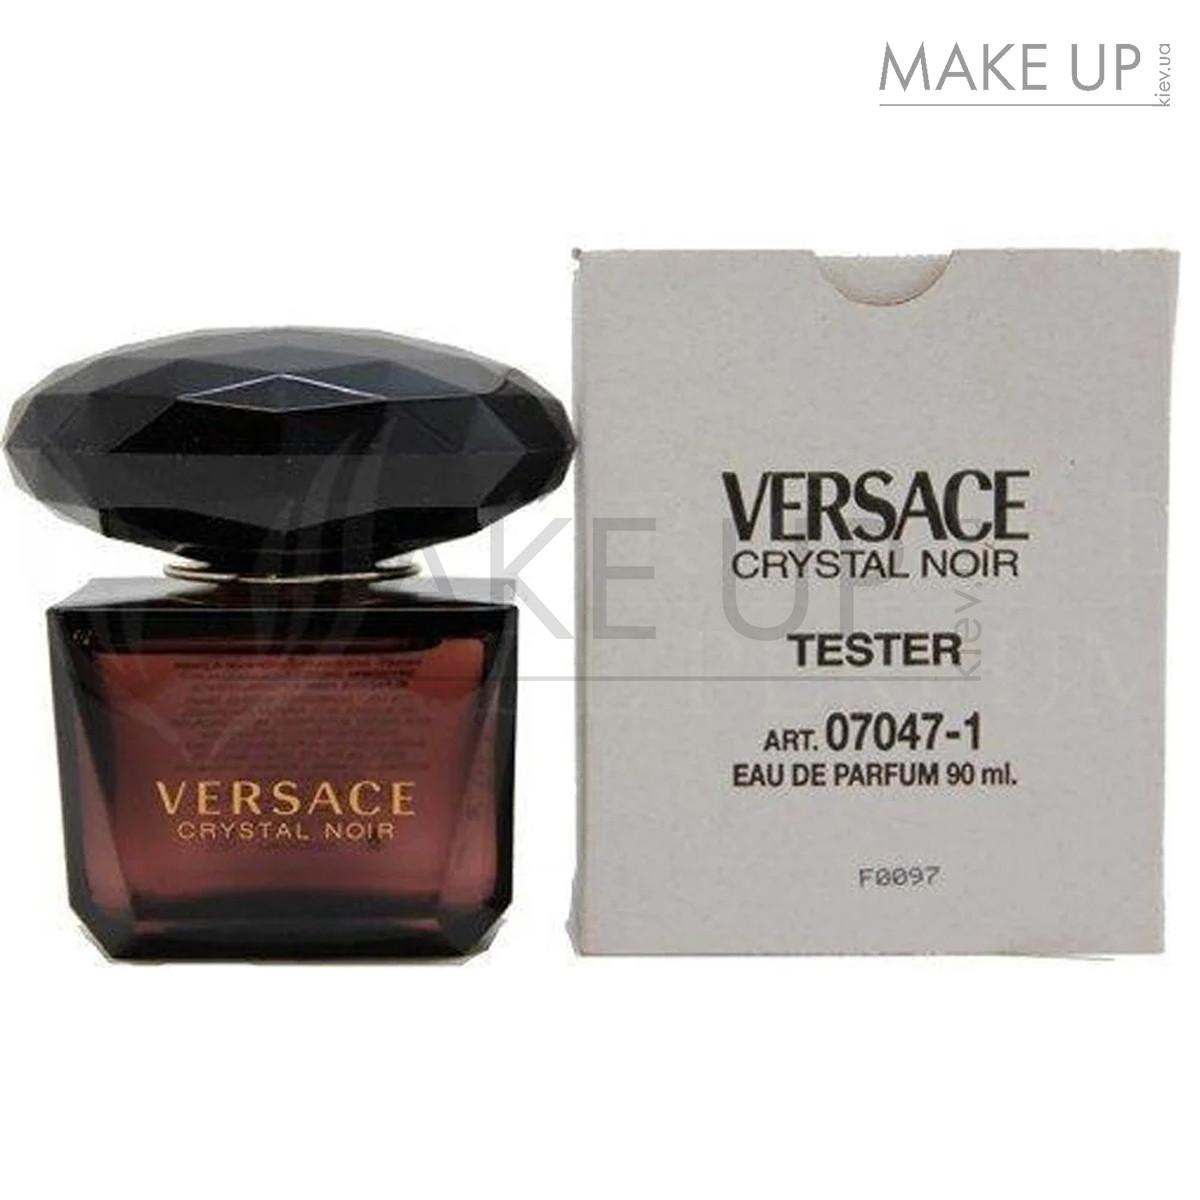 Tester женская туалетная вода Versace Crystal Noir edt 90 мл.   Лиц. ОАЭ Тестер